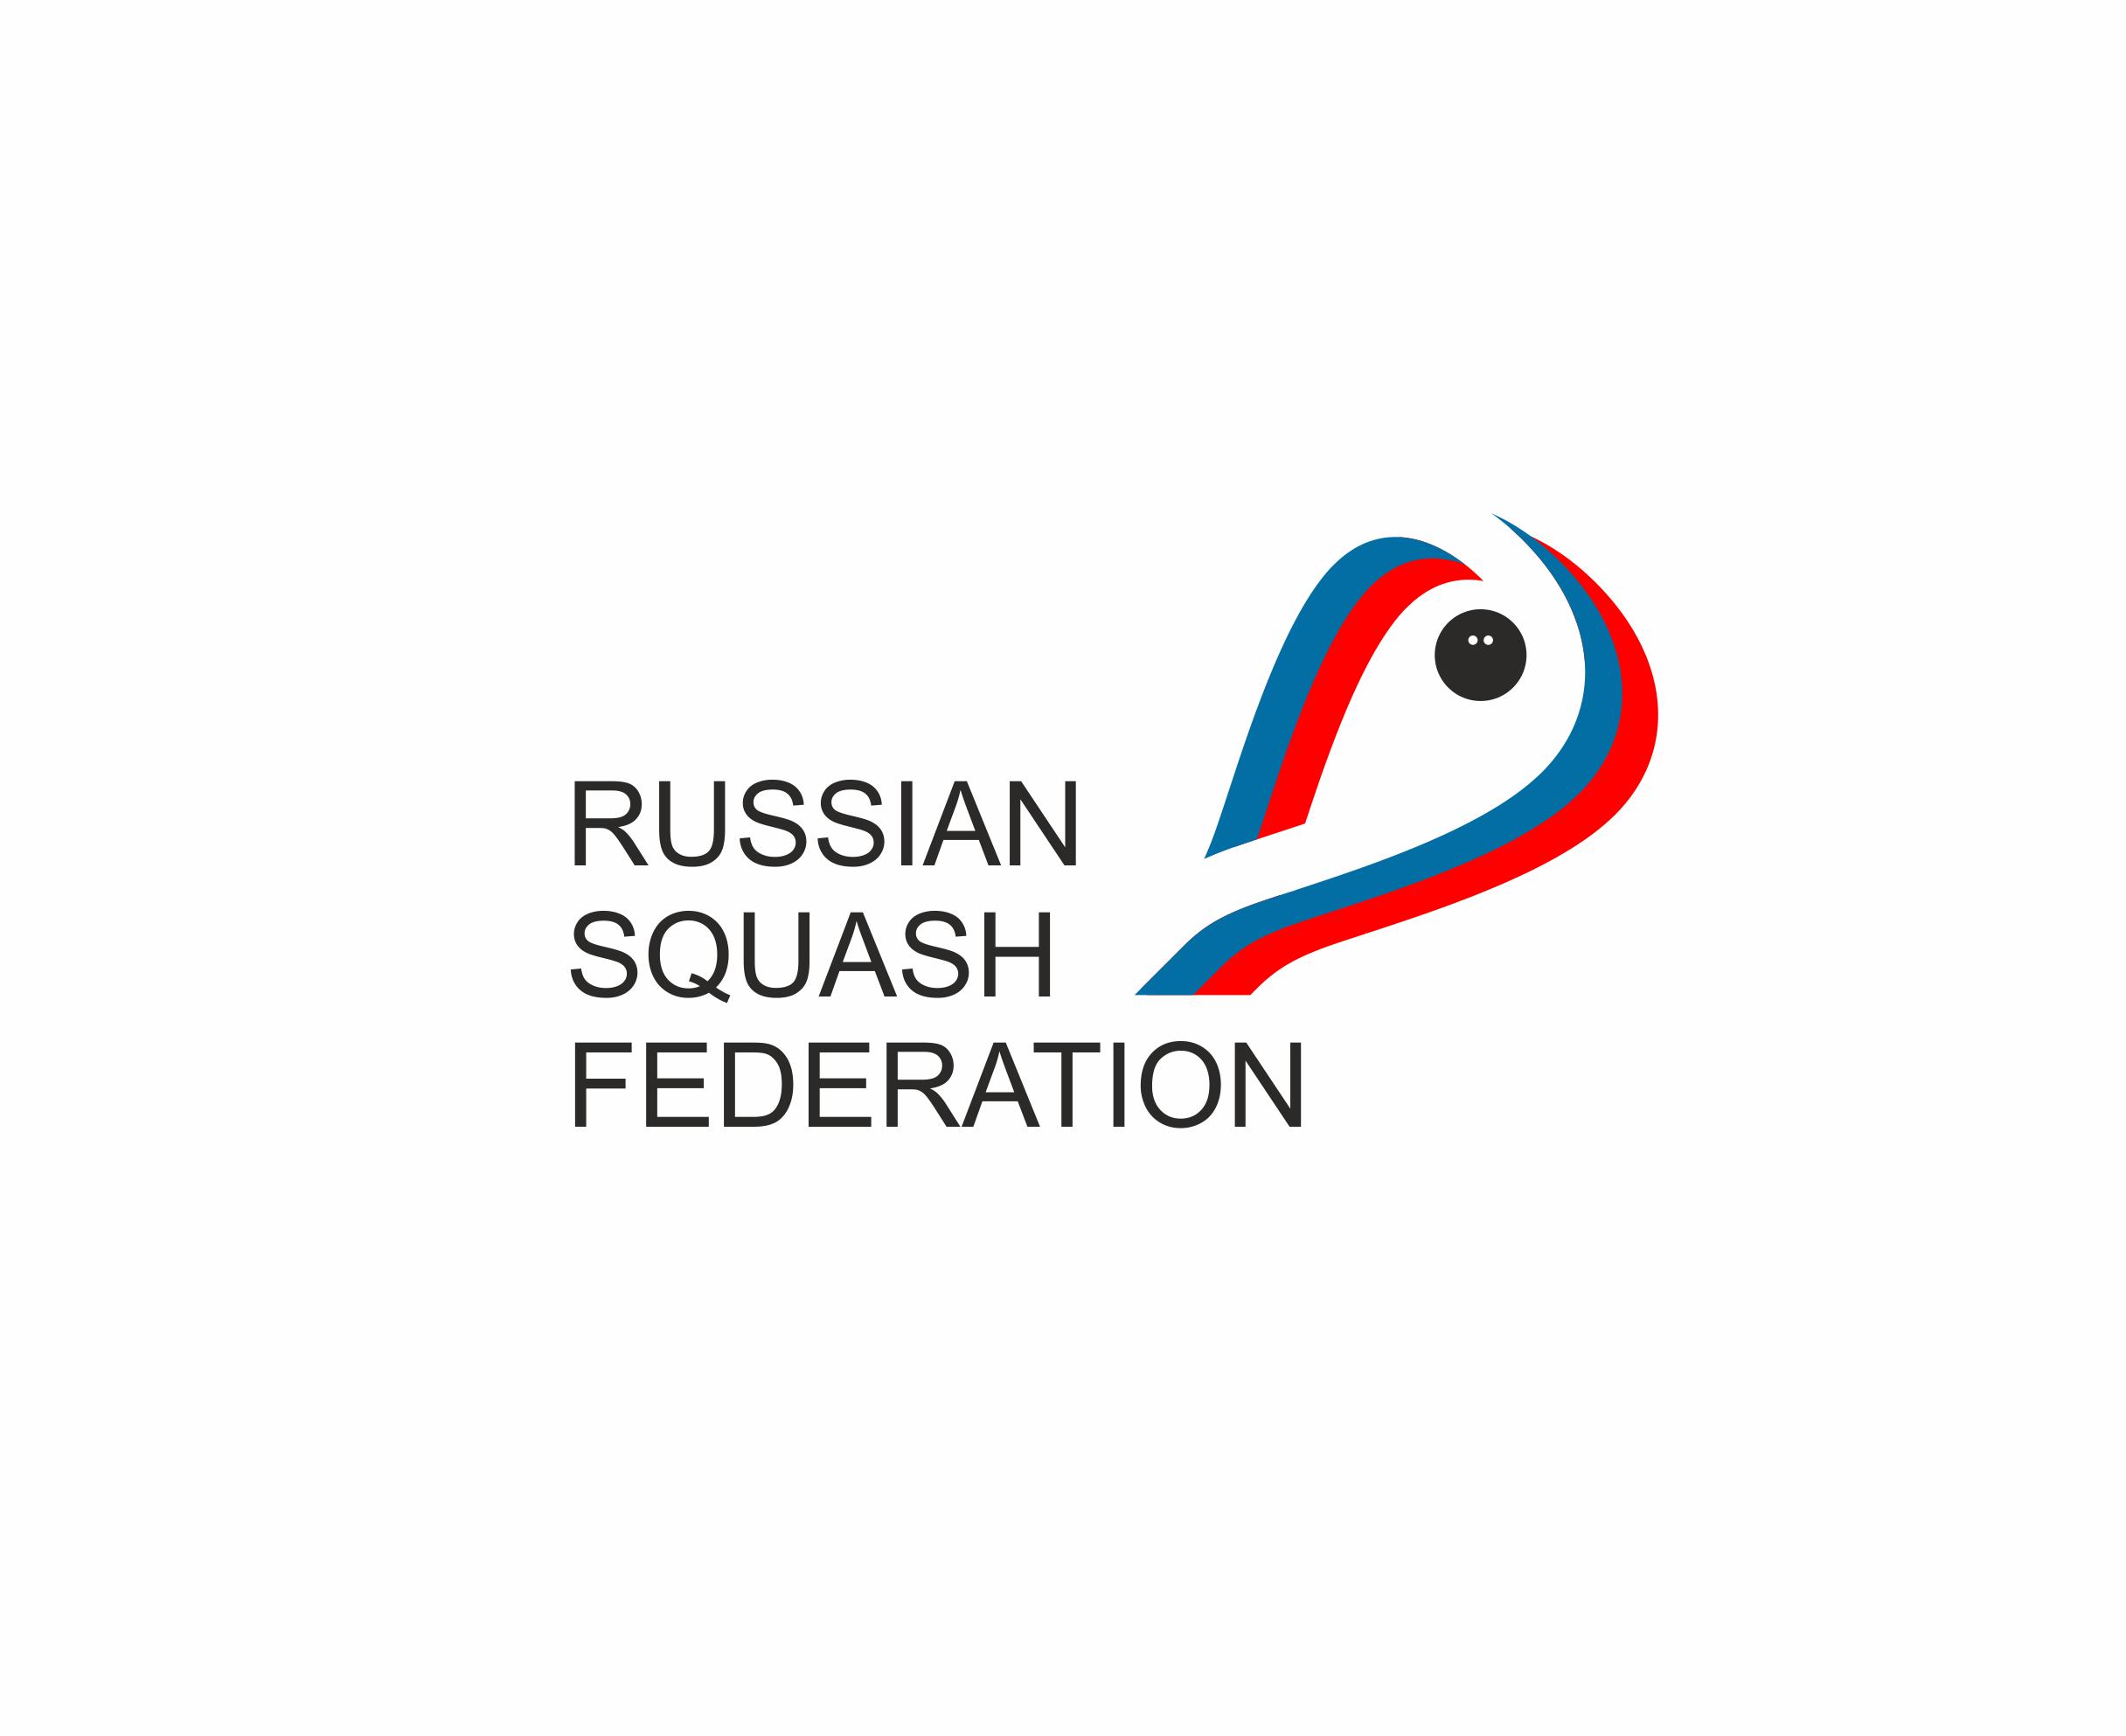 Разработать логотип для Федерации сквоша России фото f_1435f329a2f58c26.png